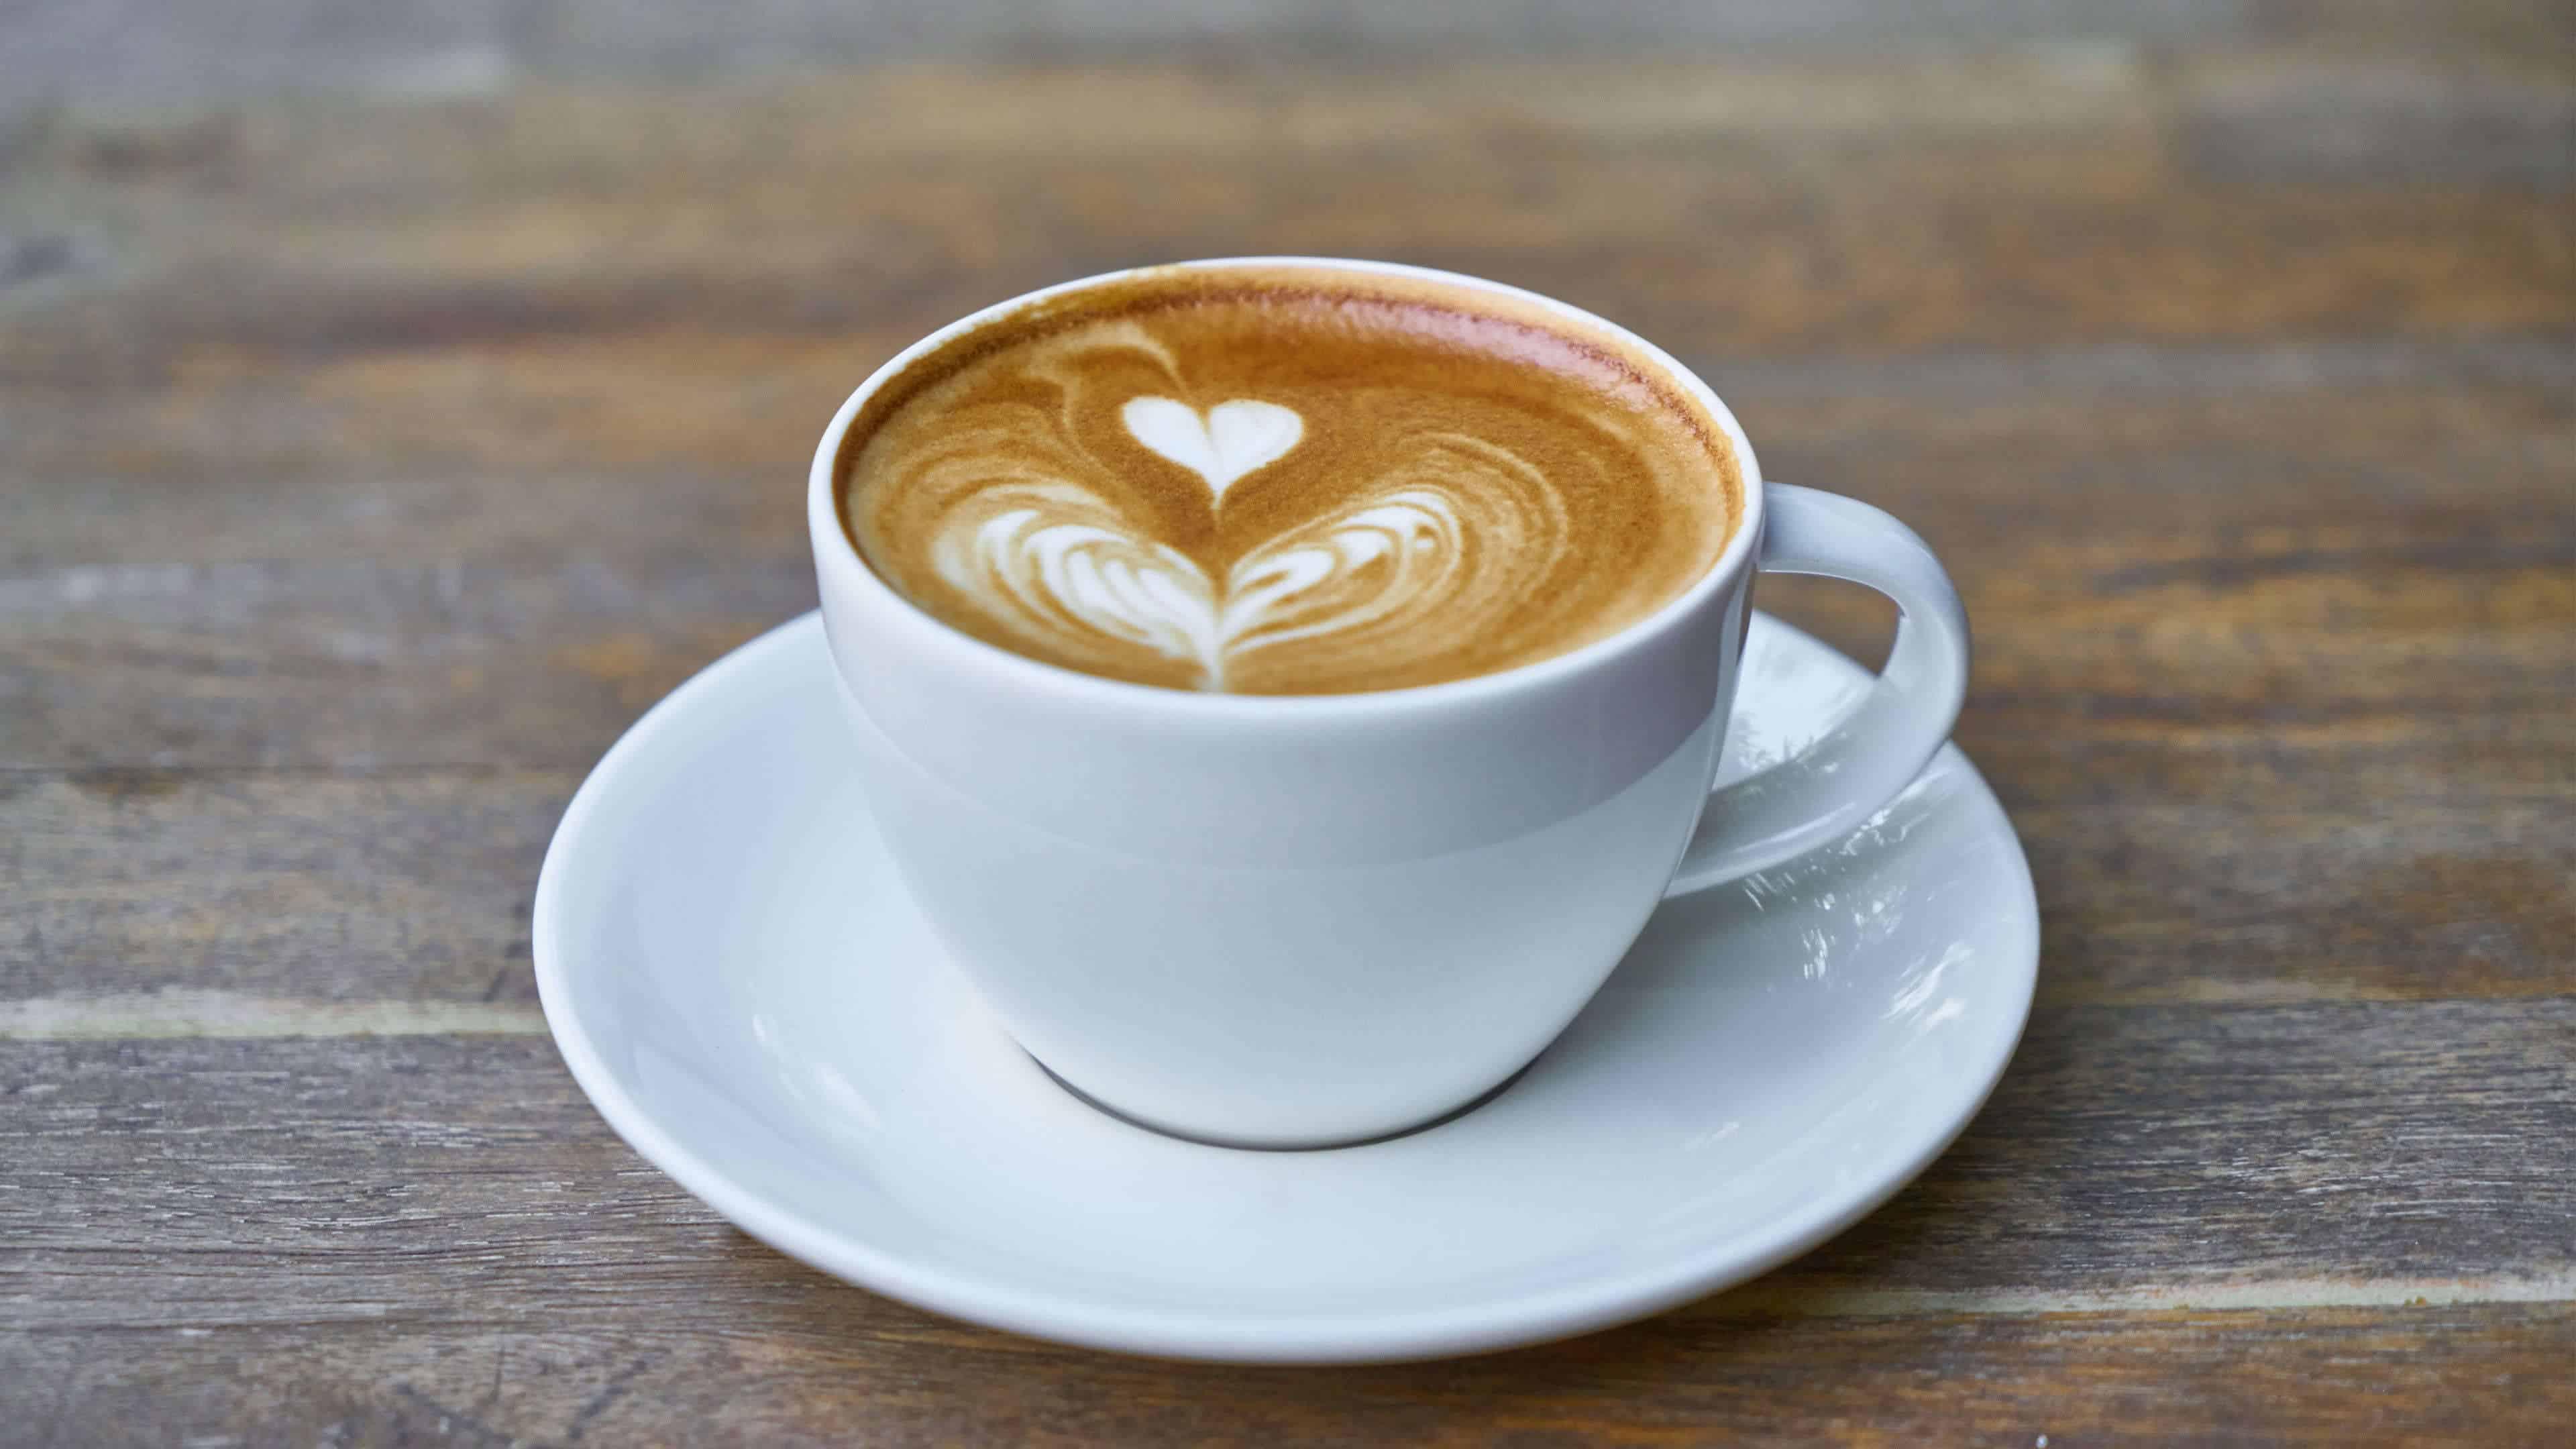 latte art wood table uhd 4k wallpaper